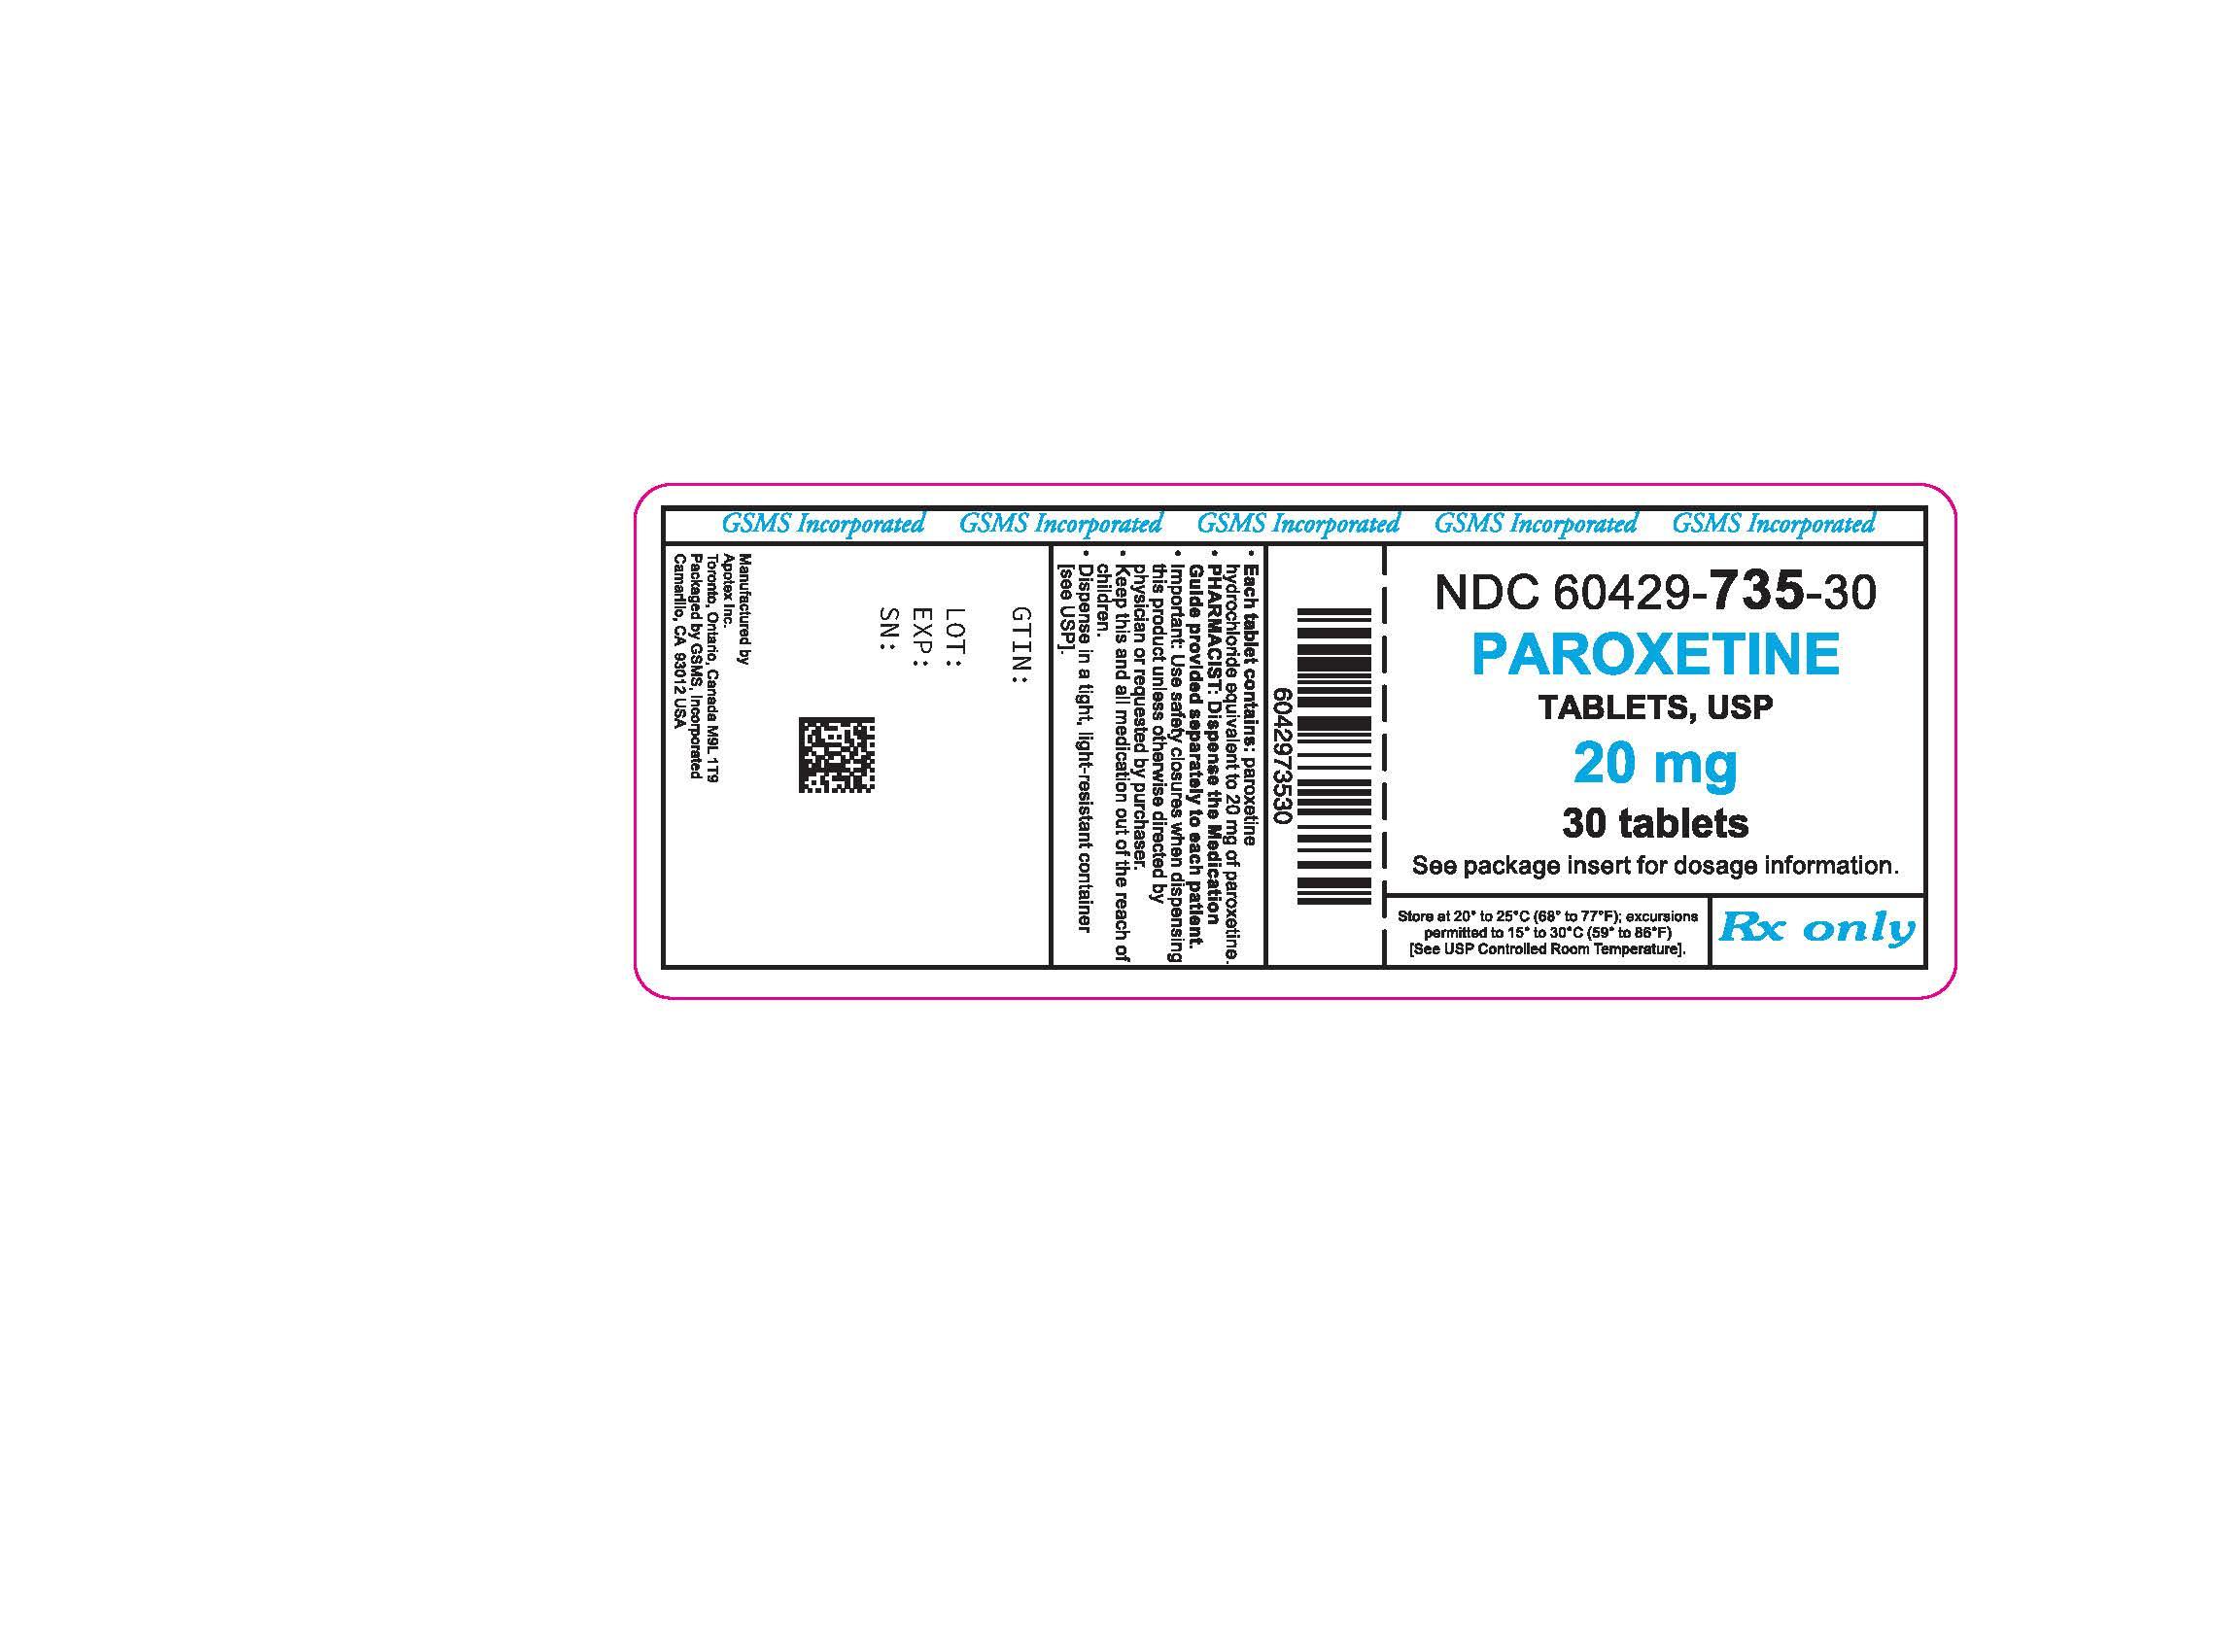 60429-735-30LB - PAROXETINE HCL 20MG TABS.jpg